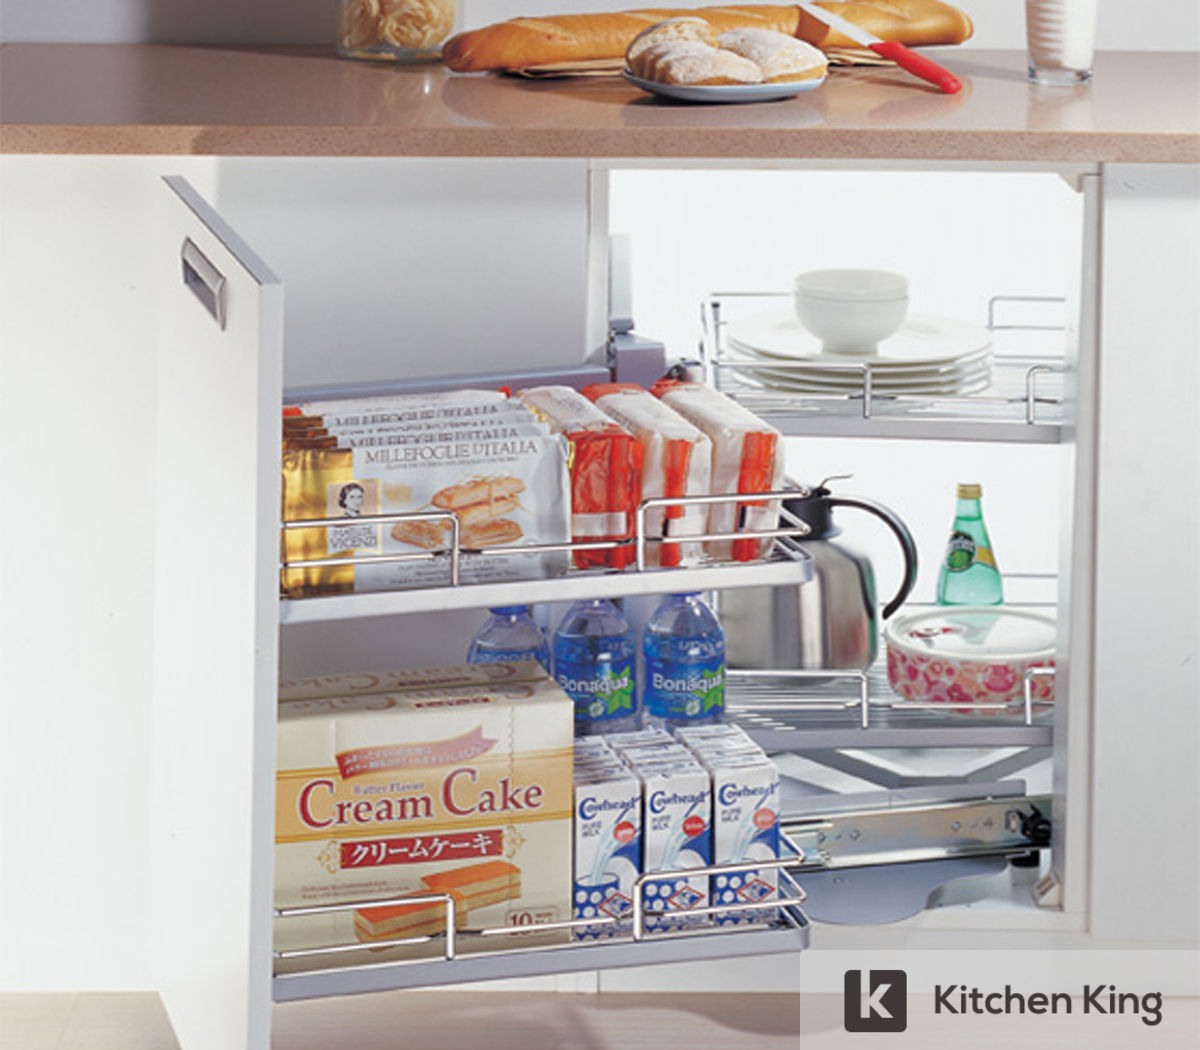 Kitchen Cupboards Accessories: Kitchen Accessories, Kitchen Cabinet Pull Out In Dubai